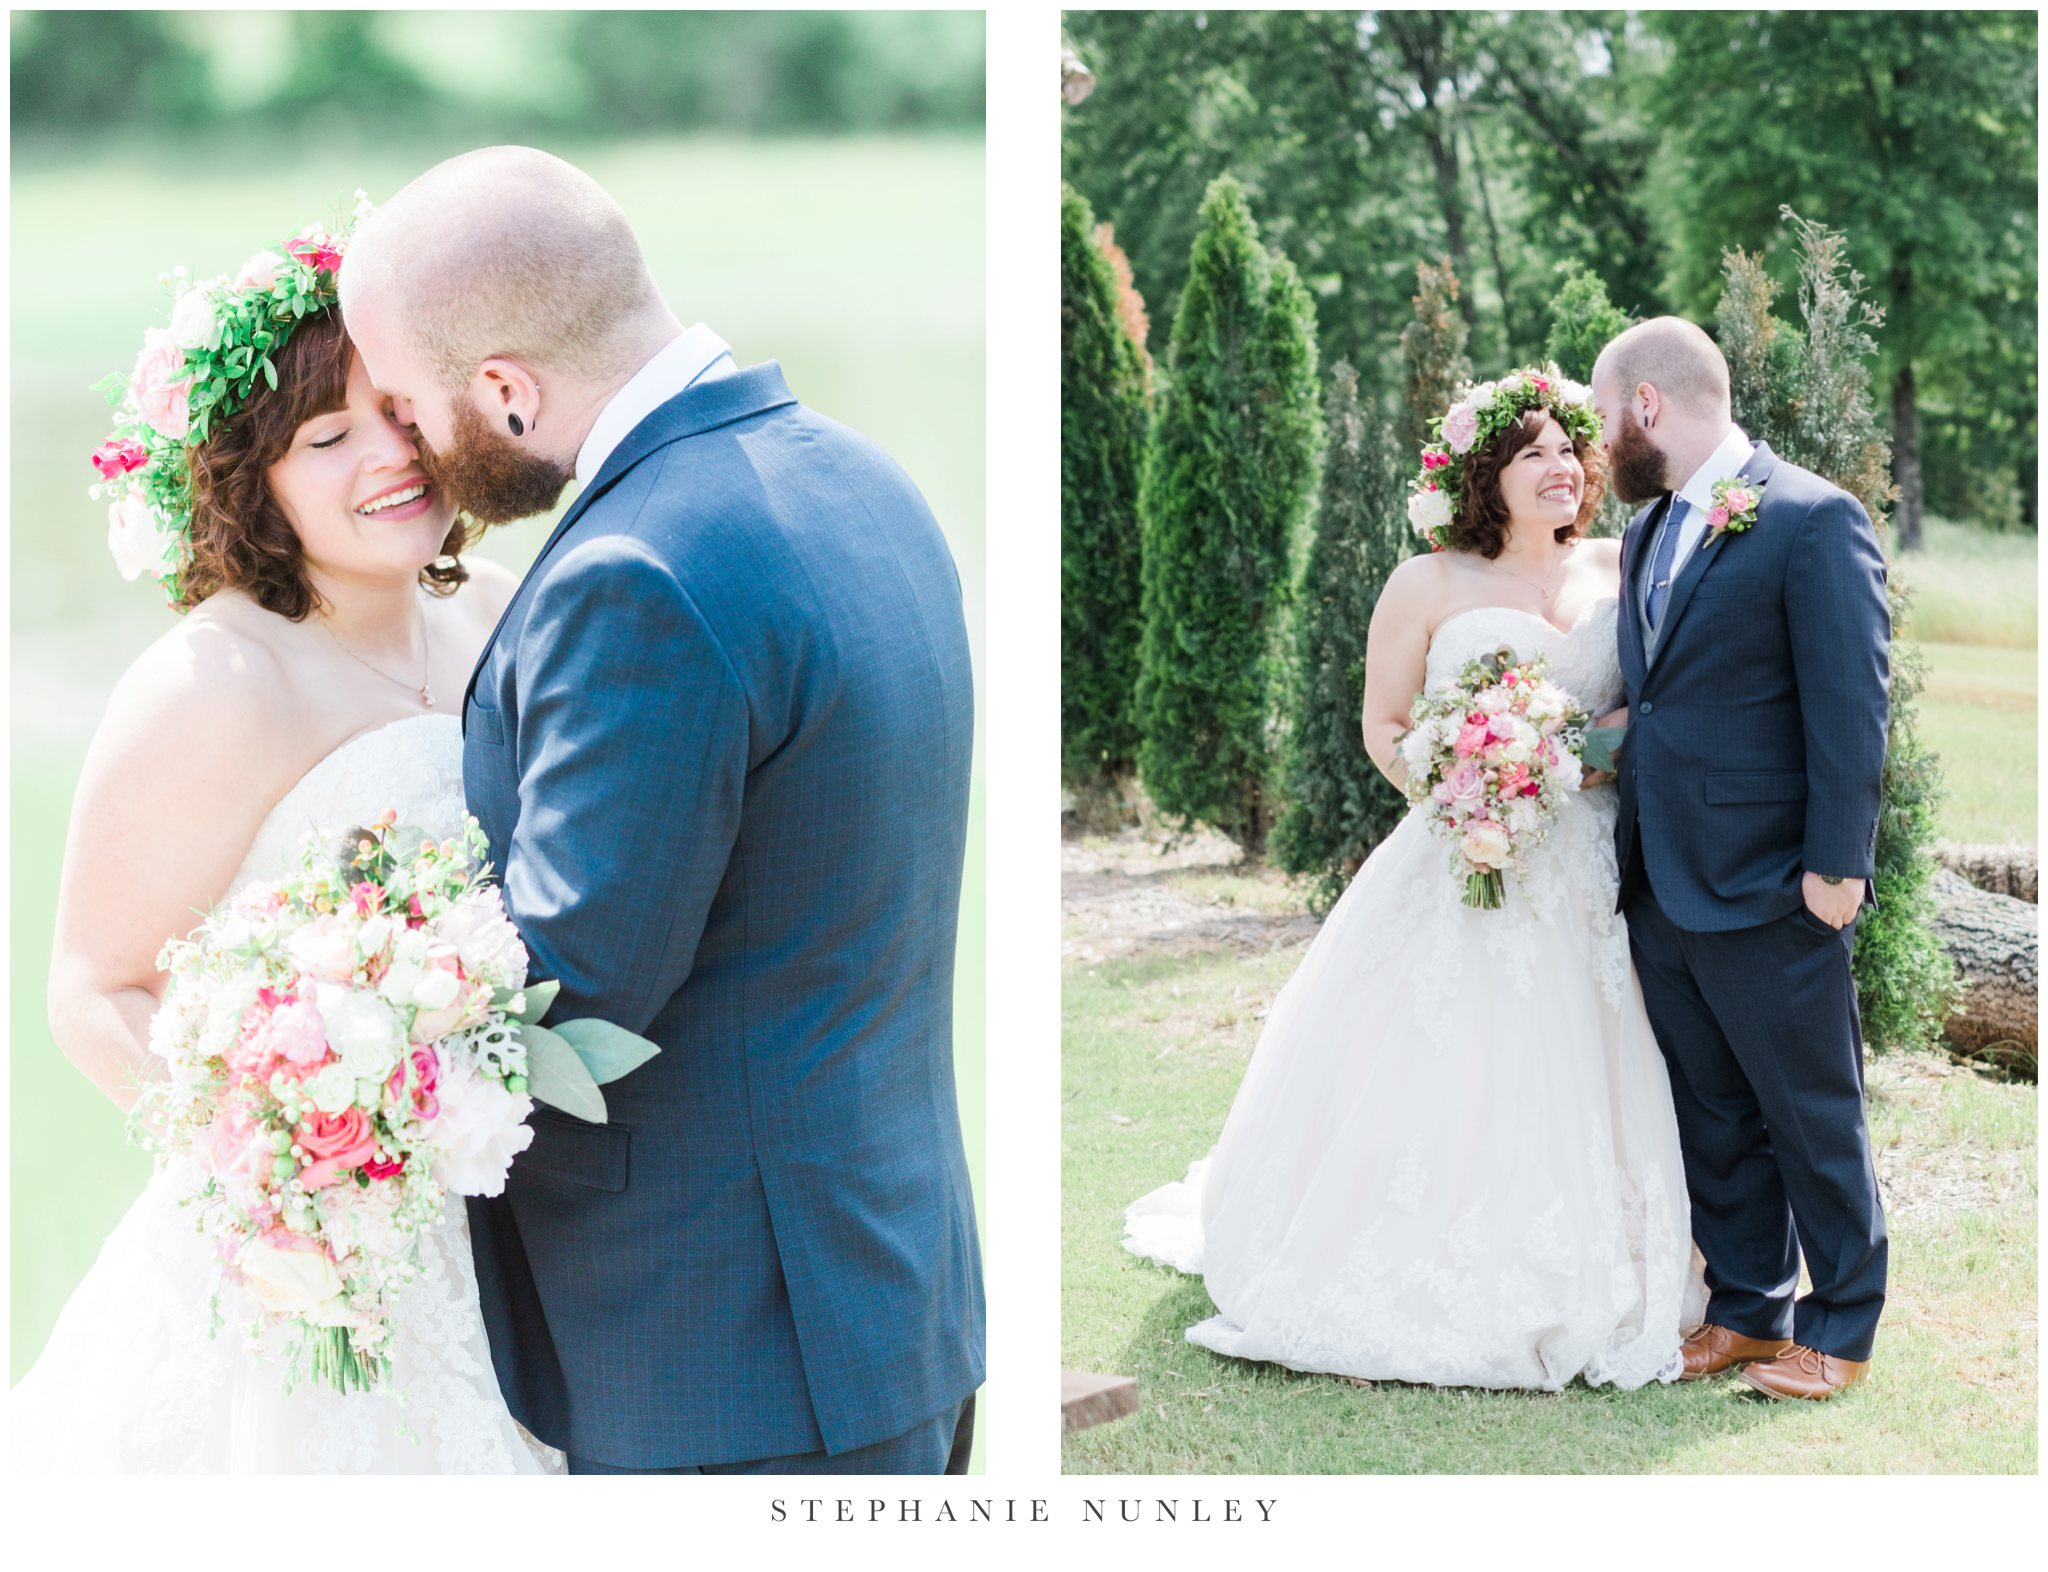 romantic-outdoor-wedding-with-flower-crown-0062.jpg